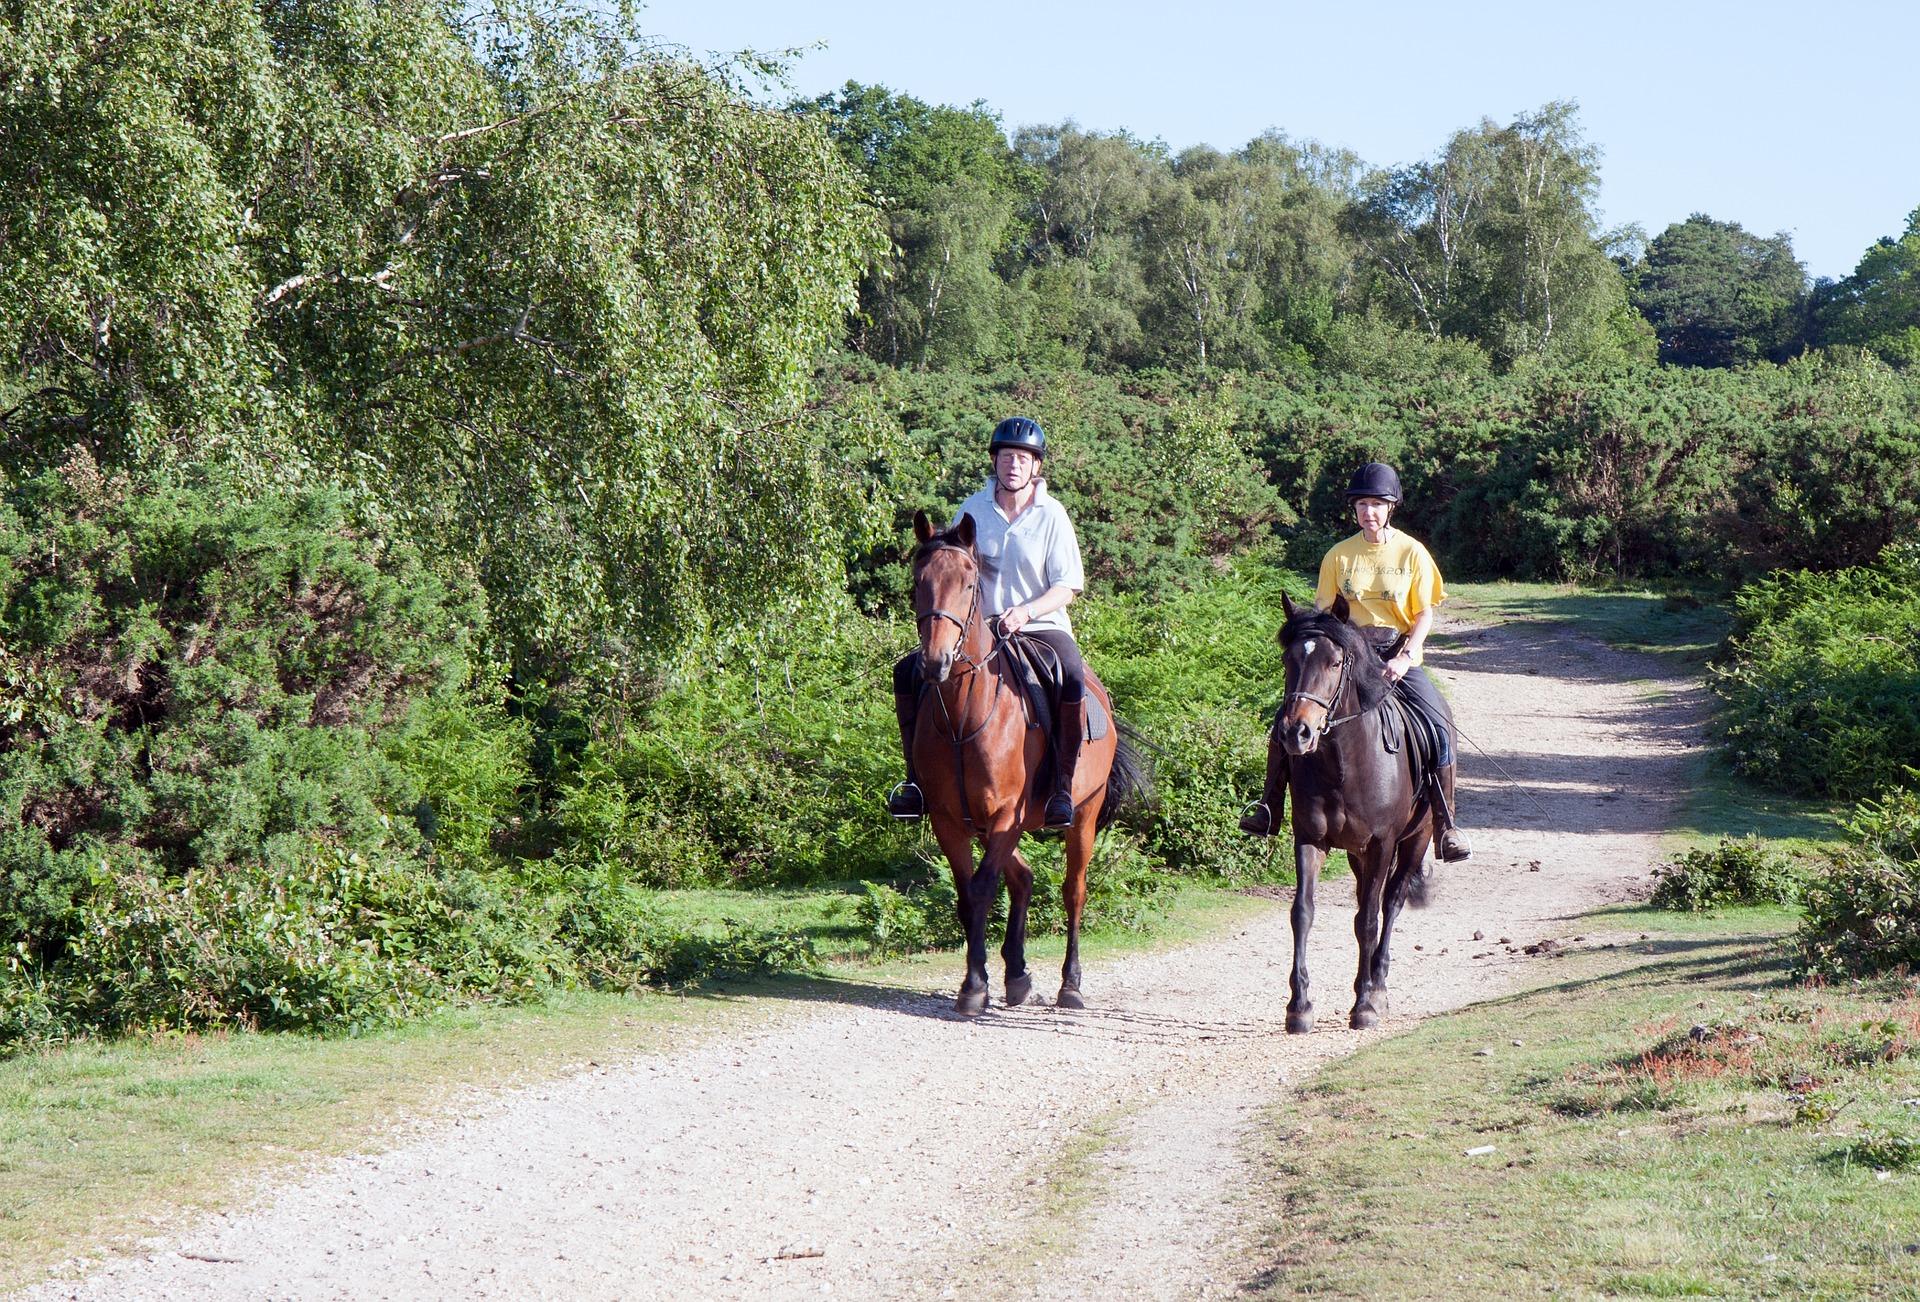 horse-riders-902123_1920